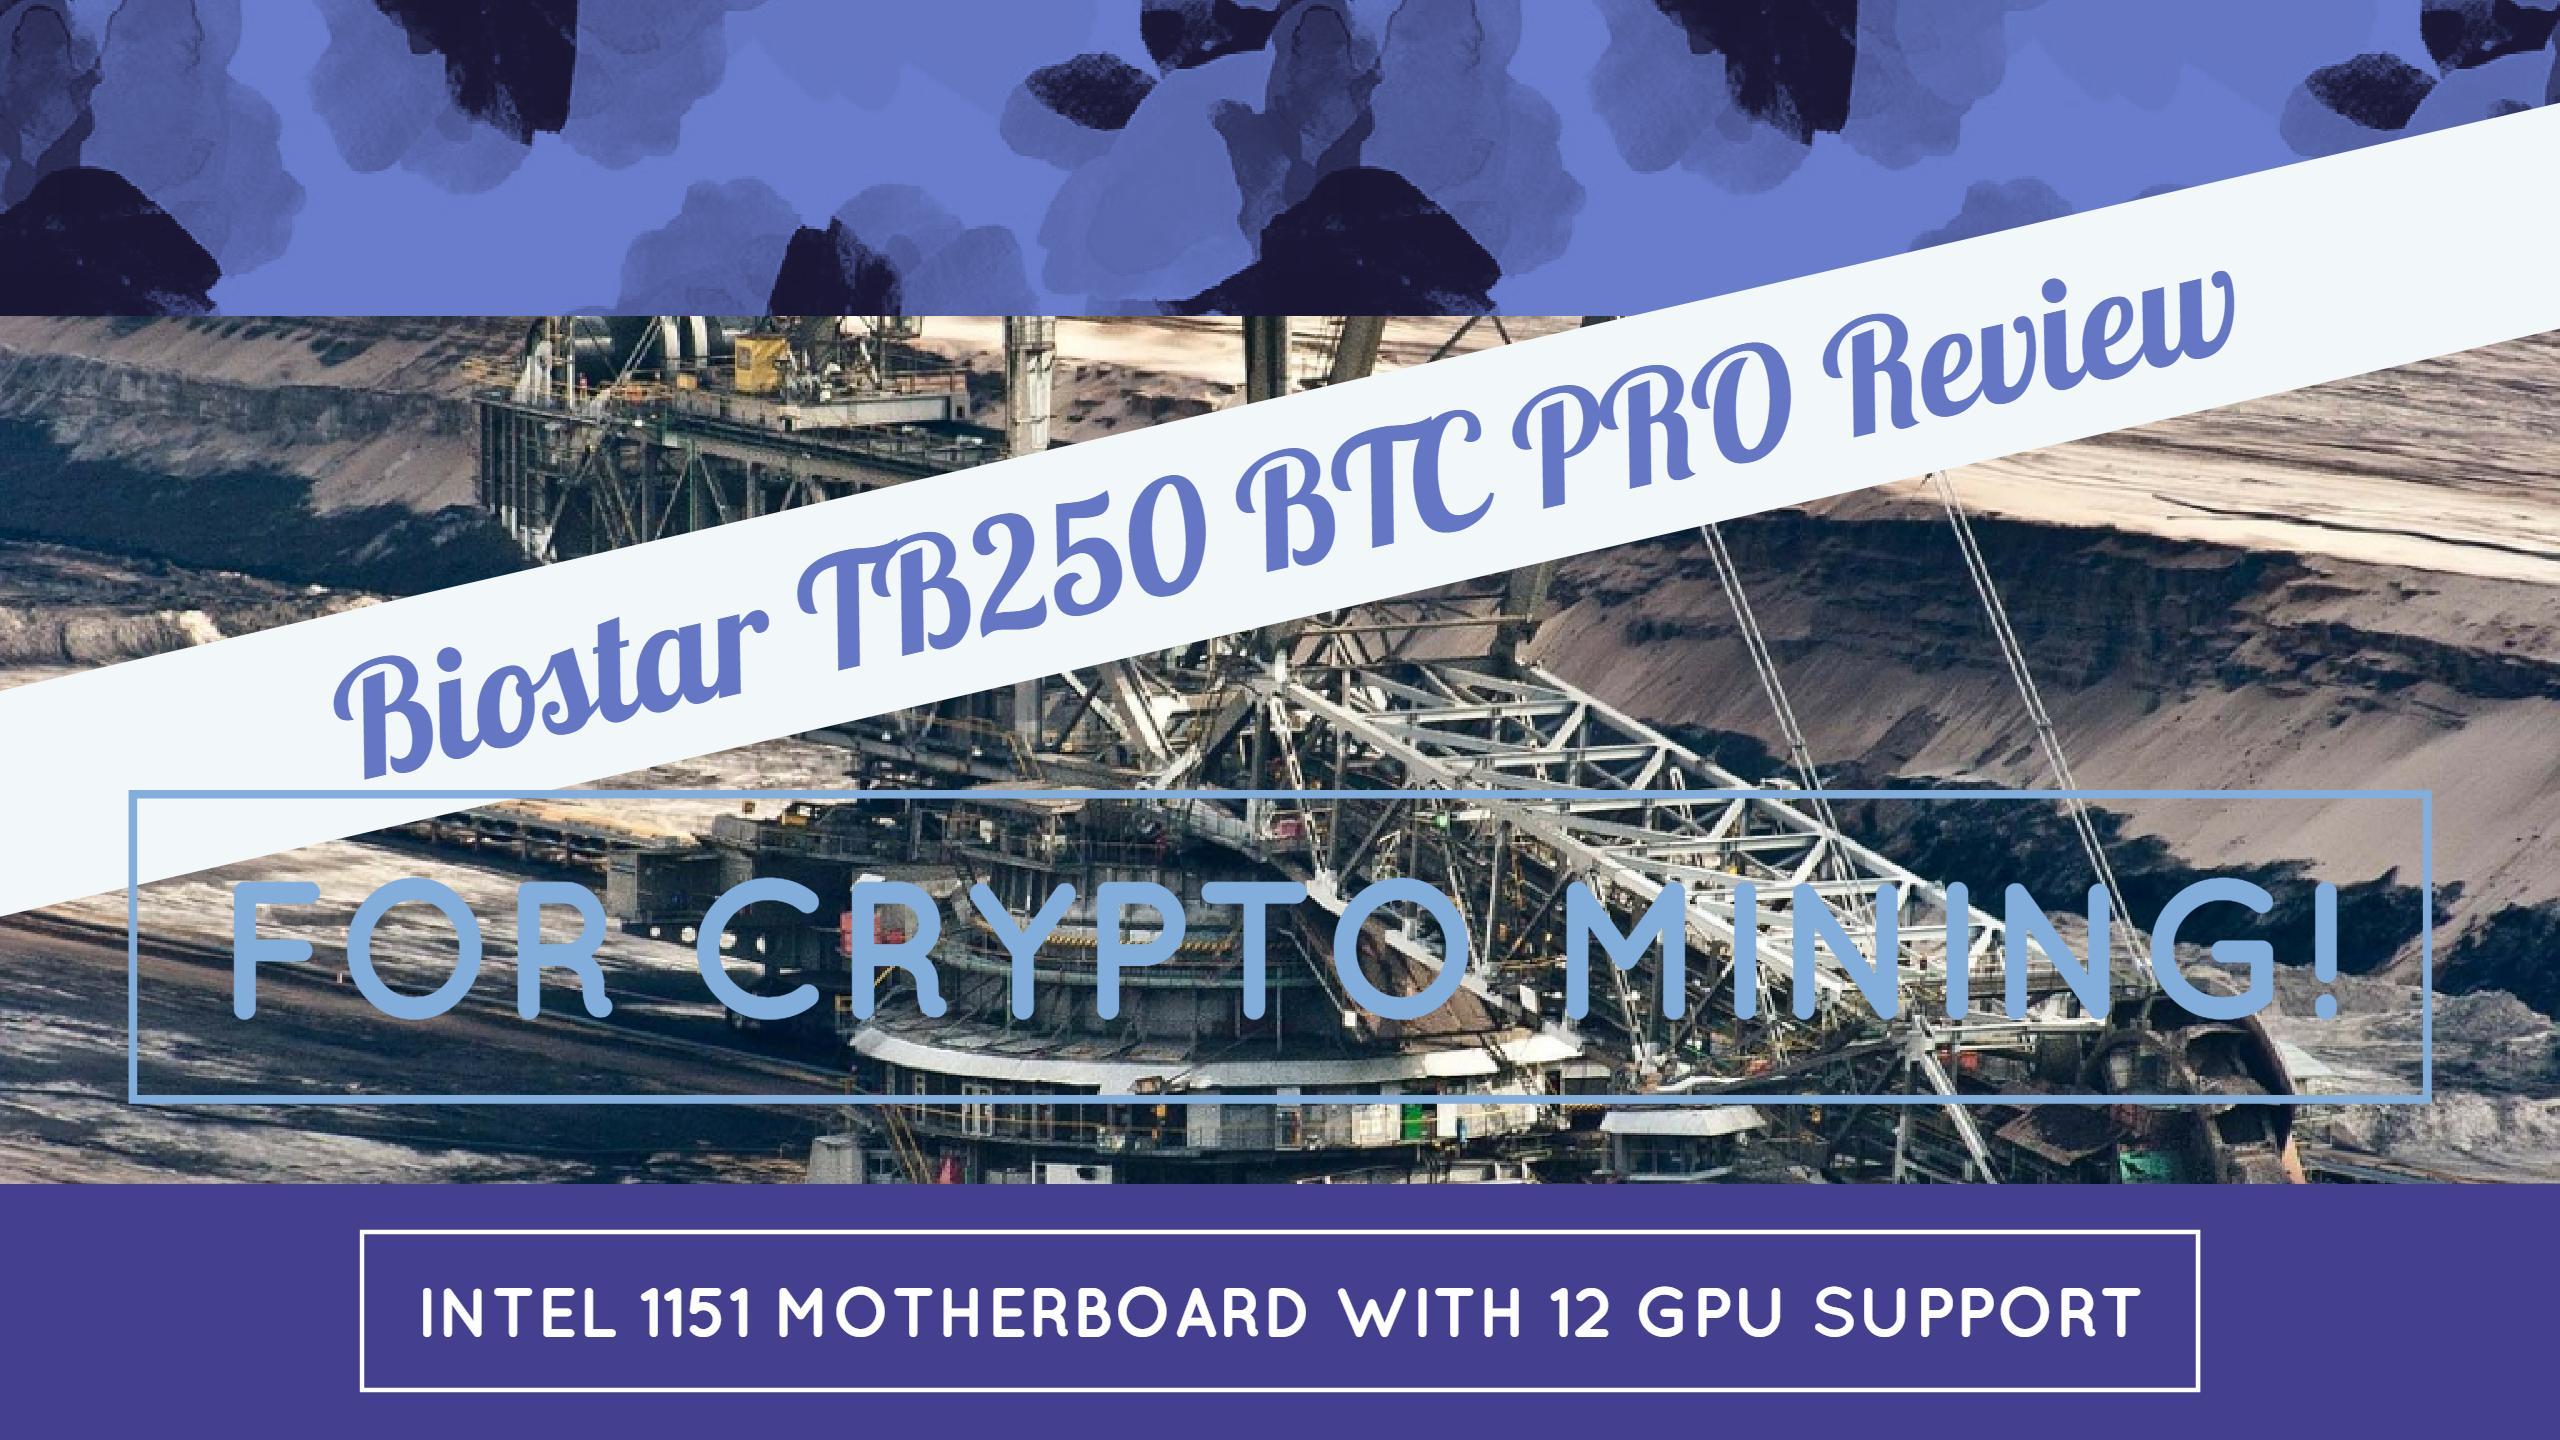 Biostar TB250 BTC PRO Review